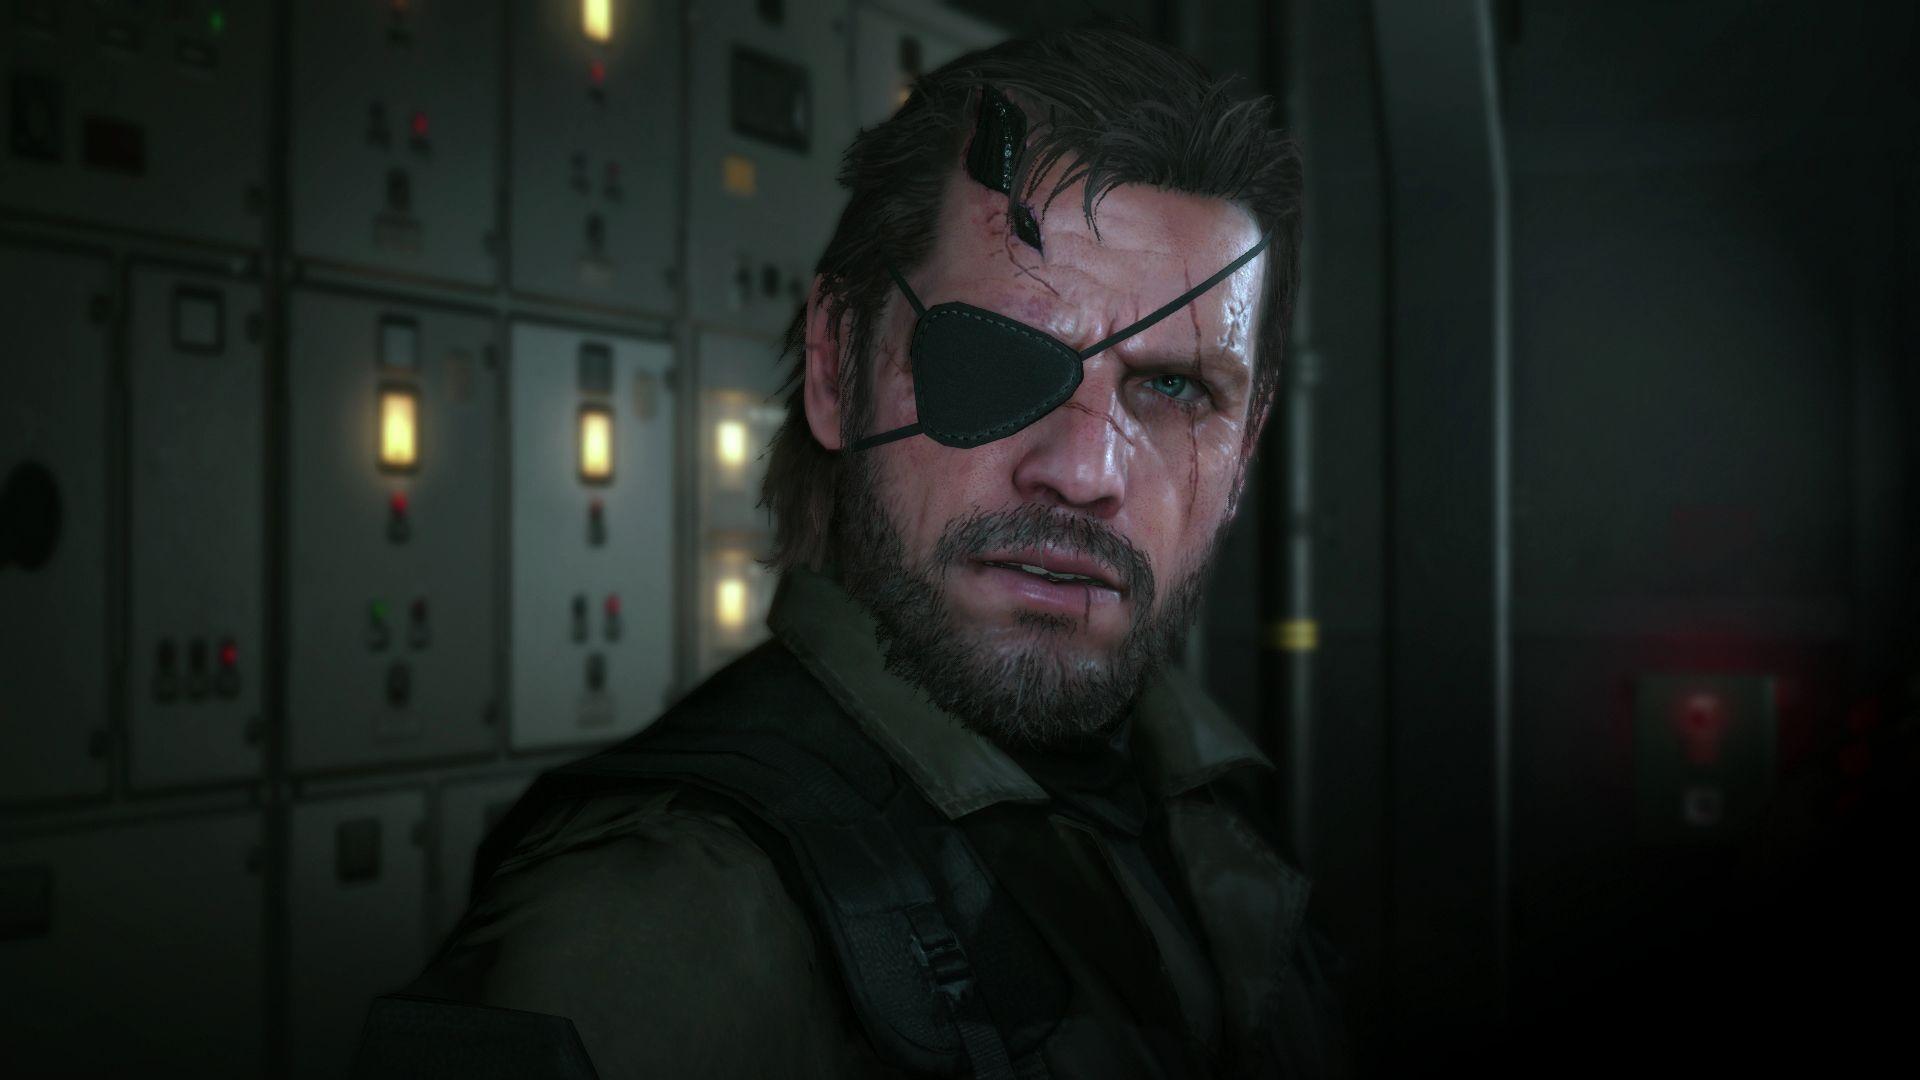 Spousta nových HD obrázků z Metal Gear Solid V: The Phantom Pain 110494